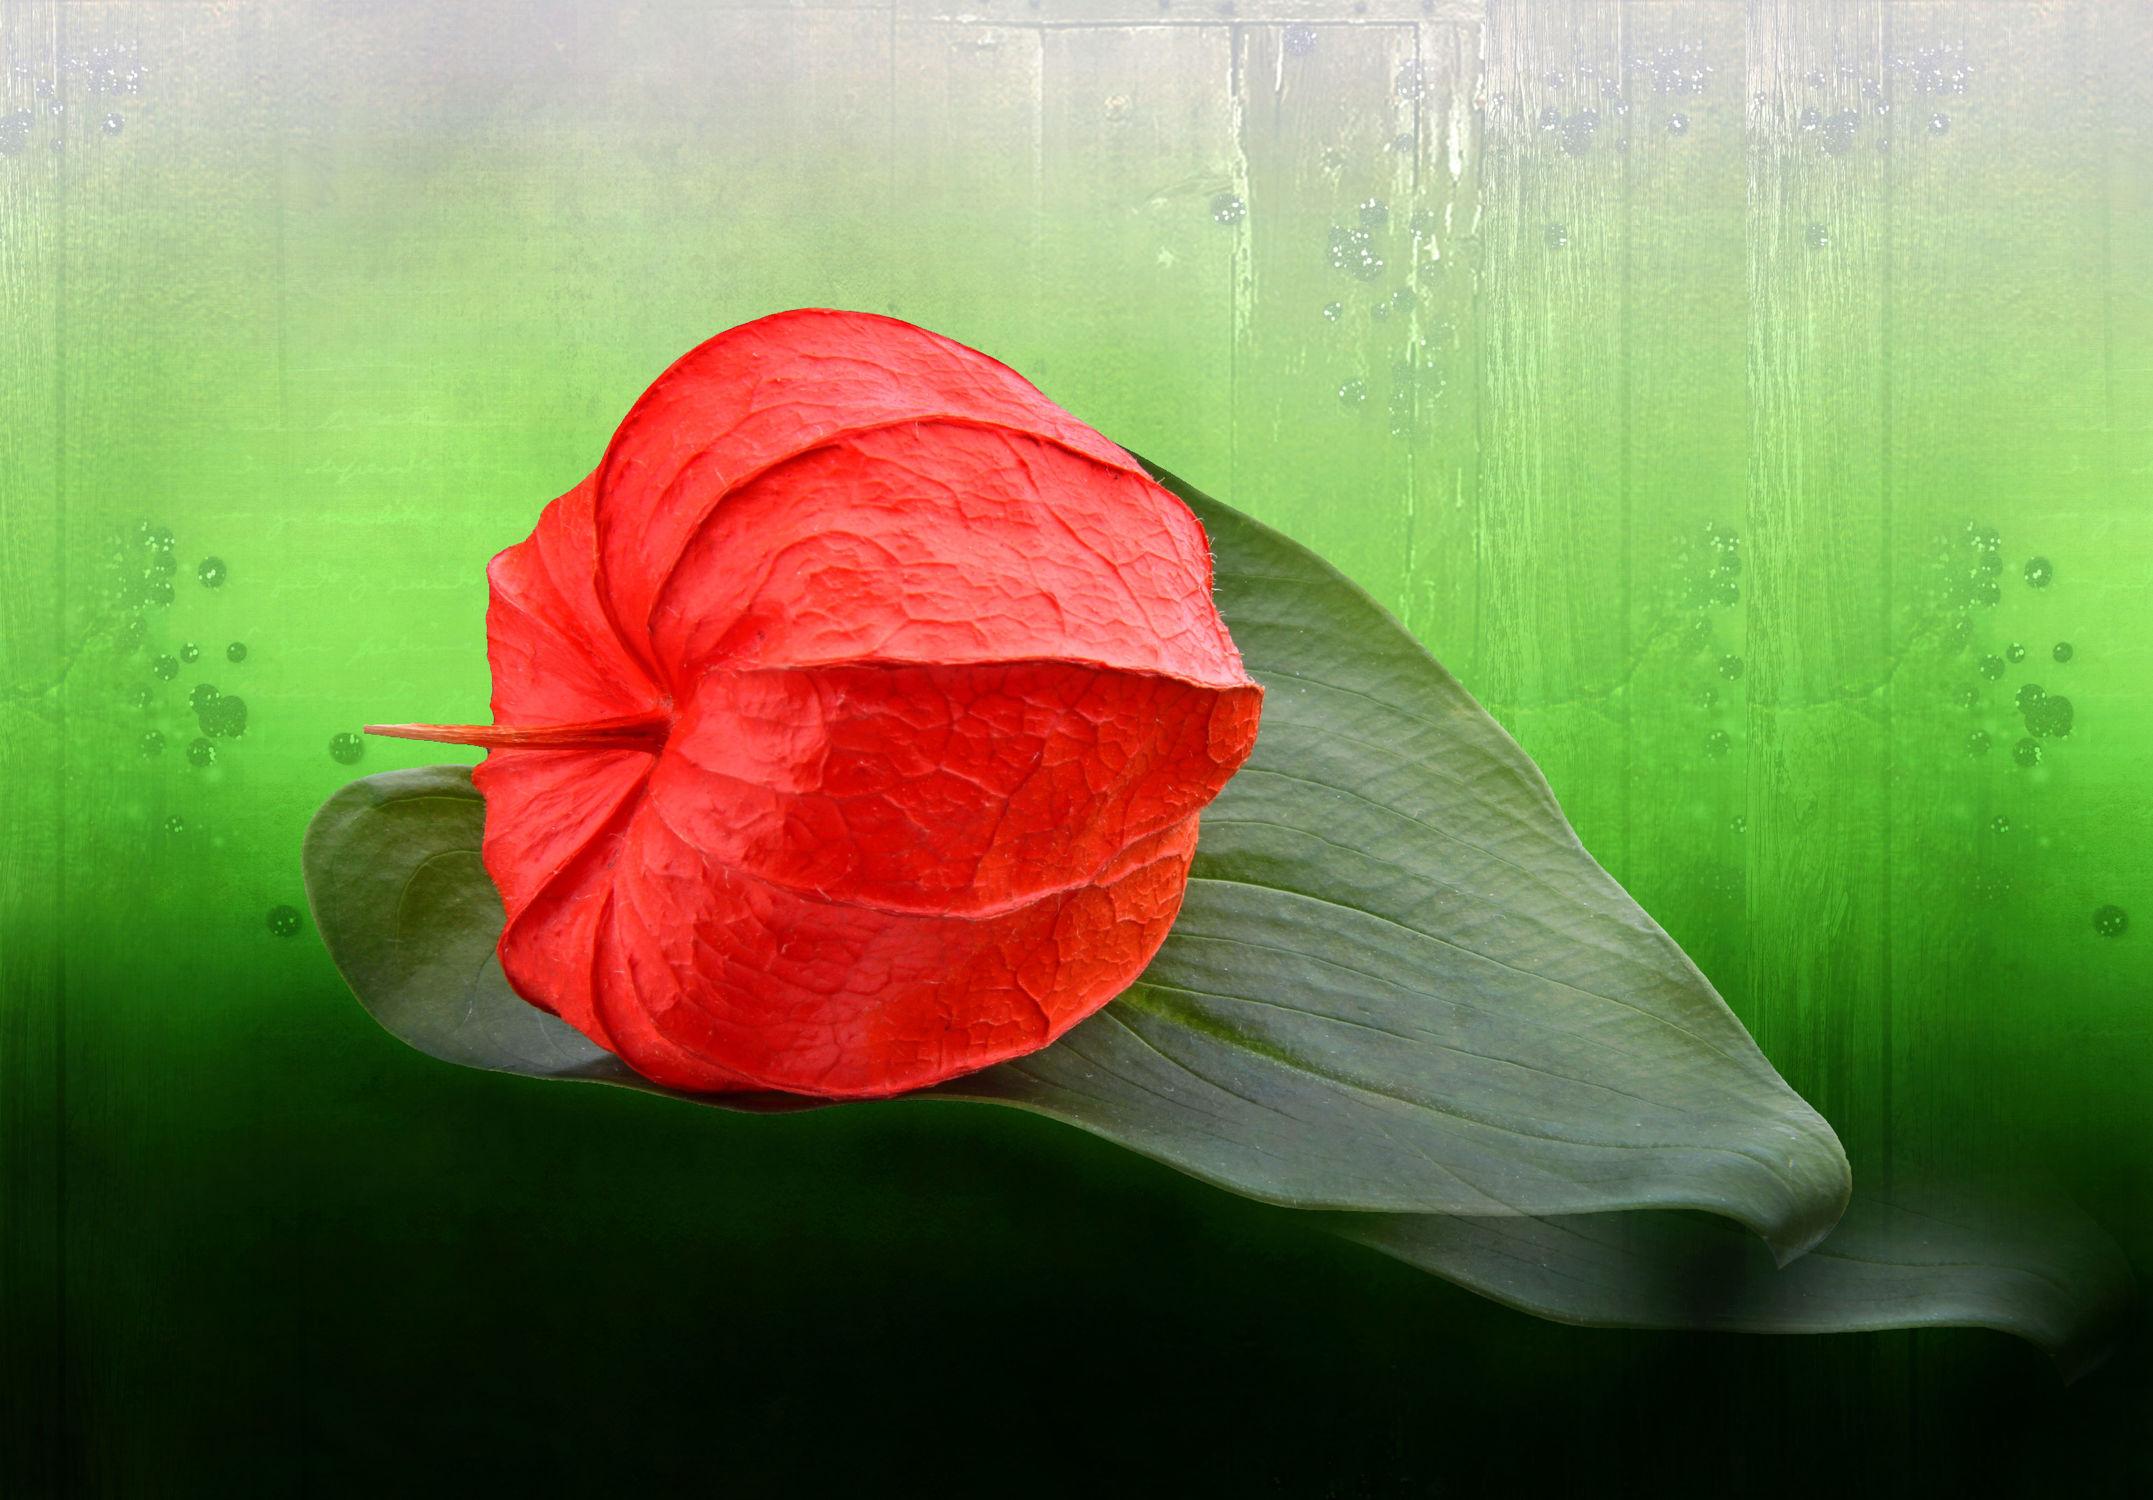 Bild mit Rot, Blume, Pflanze, Blatt, Floral, Blüten, Florales, Textur, blüte, lampions, lampion